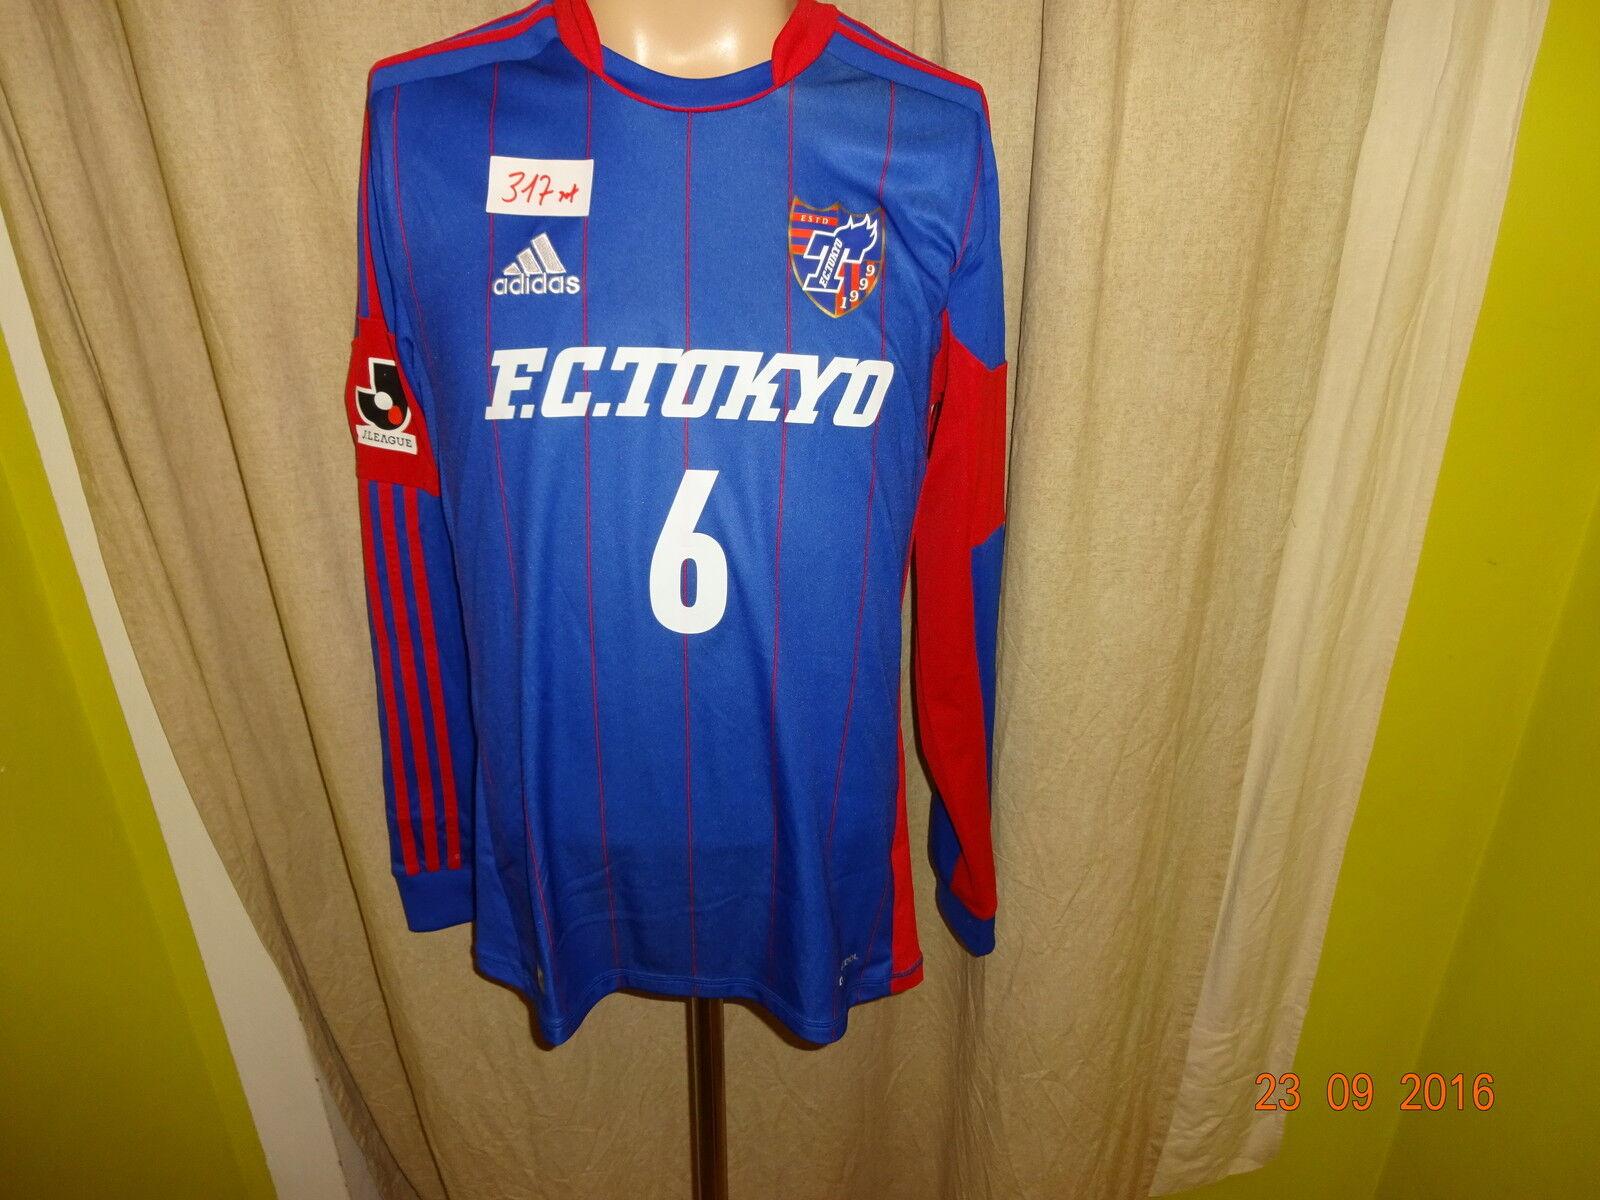 F.C.Tokyo Original Adidas Langarm Jugend Matchworn Trikot 2012 13 + Nr.6 Gr.M